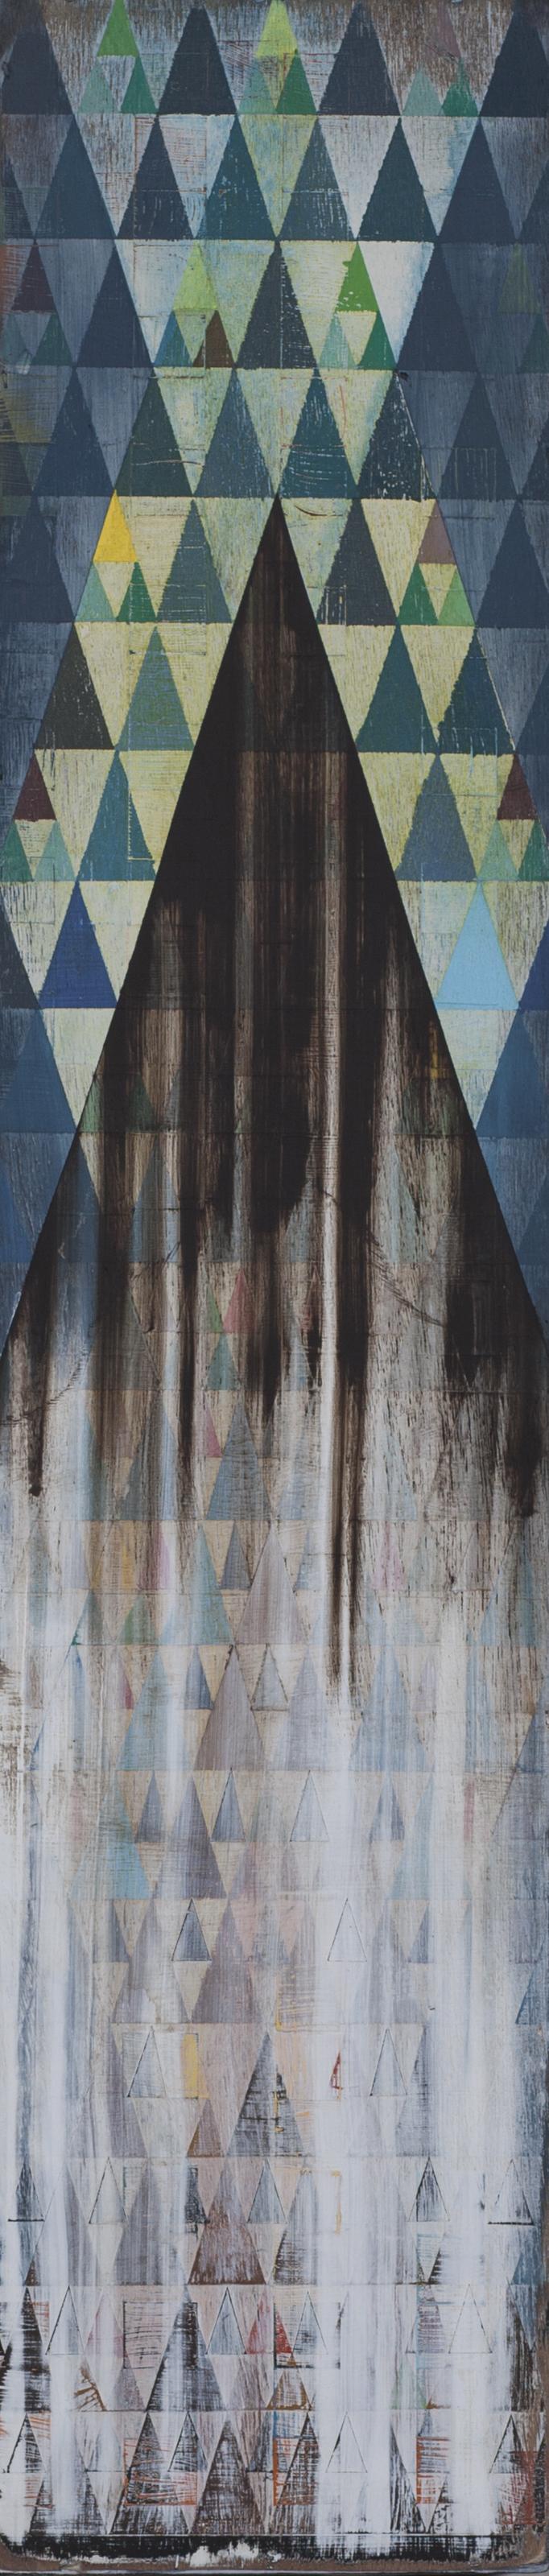 "Lost Coast, 9""x36"", acrylic on wood panel"